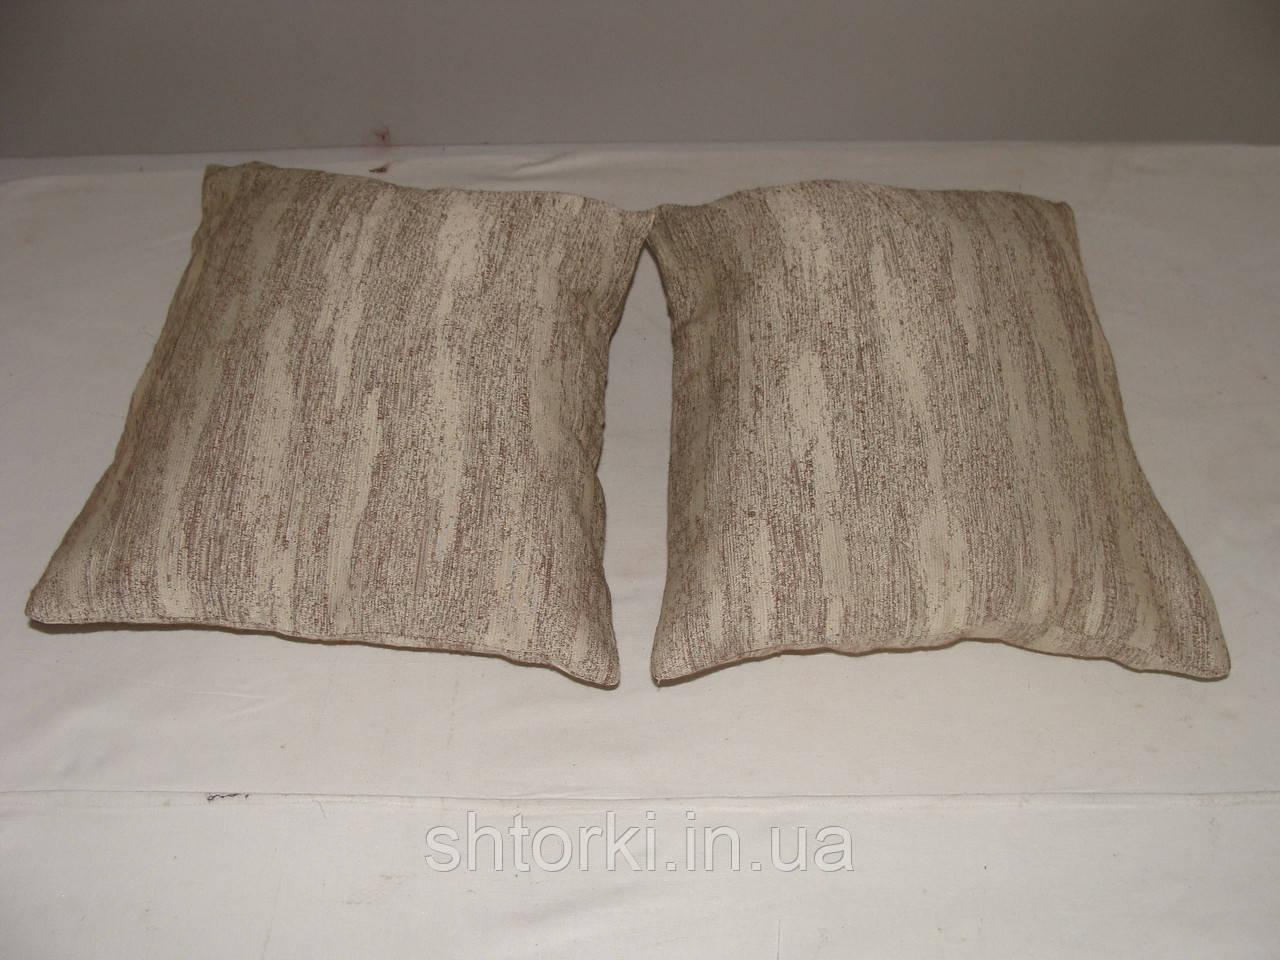 Комплект подушек  Короед беж , 2 шт 35х25